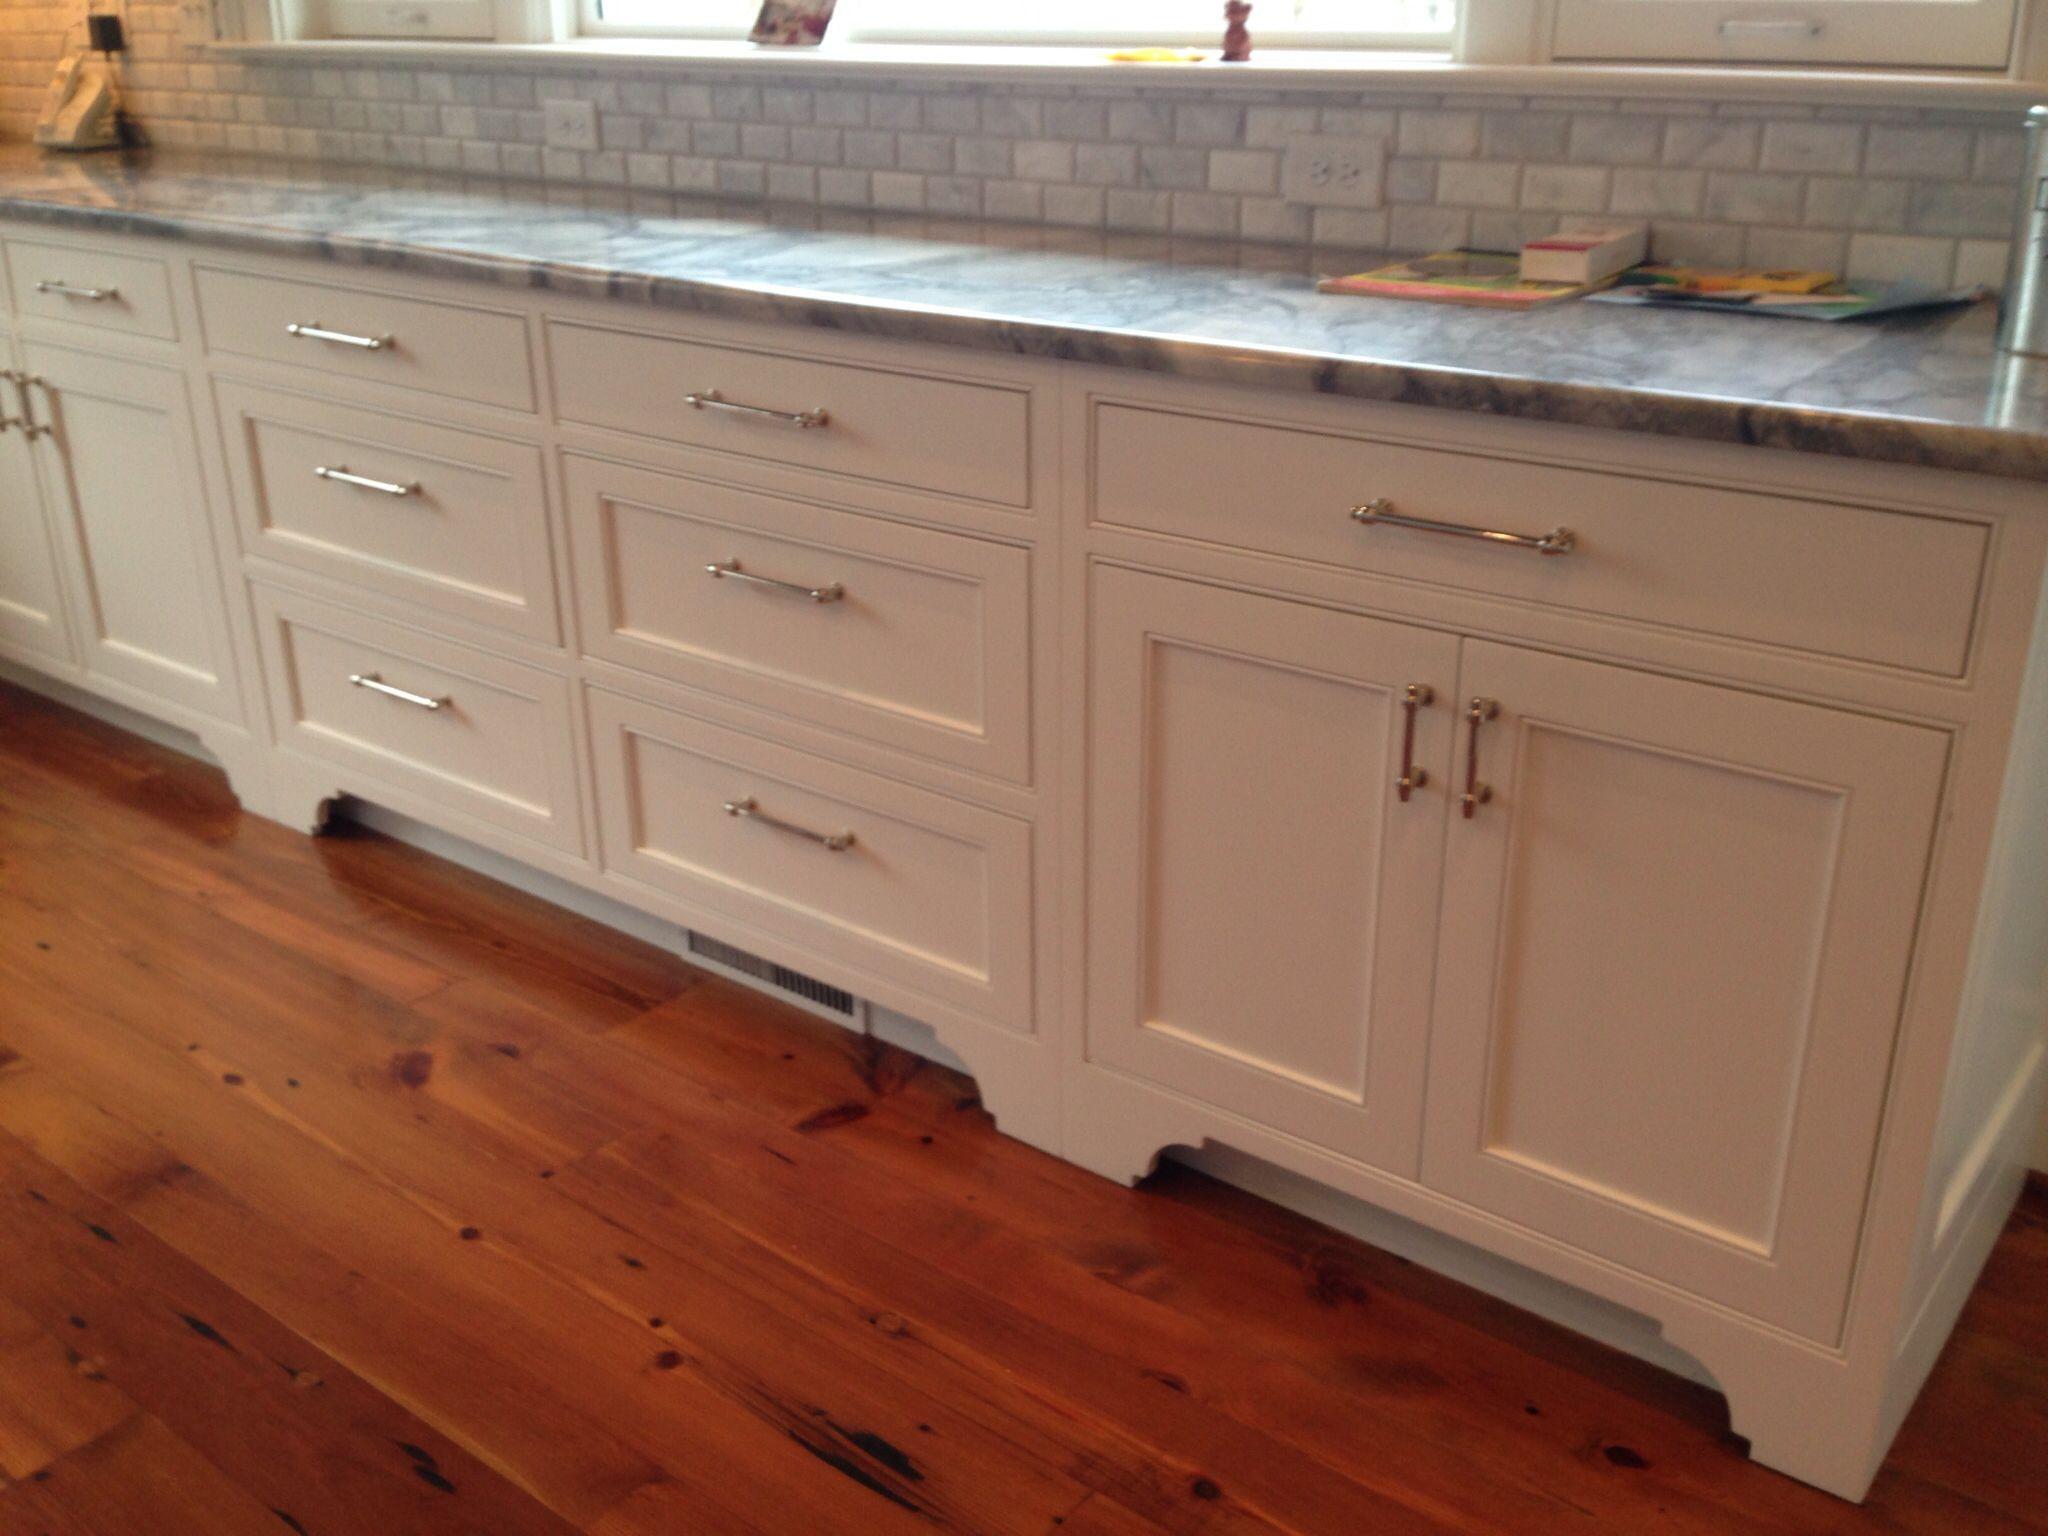 Inset Cabinets Kitchen Cabinets Inset Cabinets Lake House Kitchen